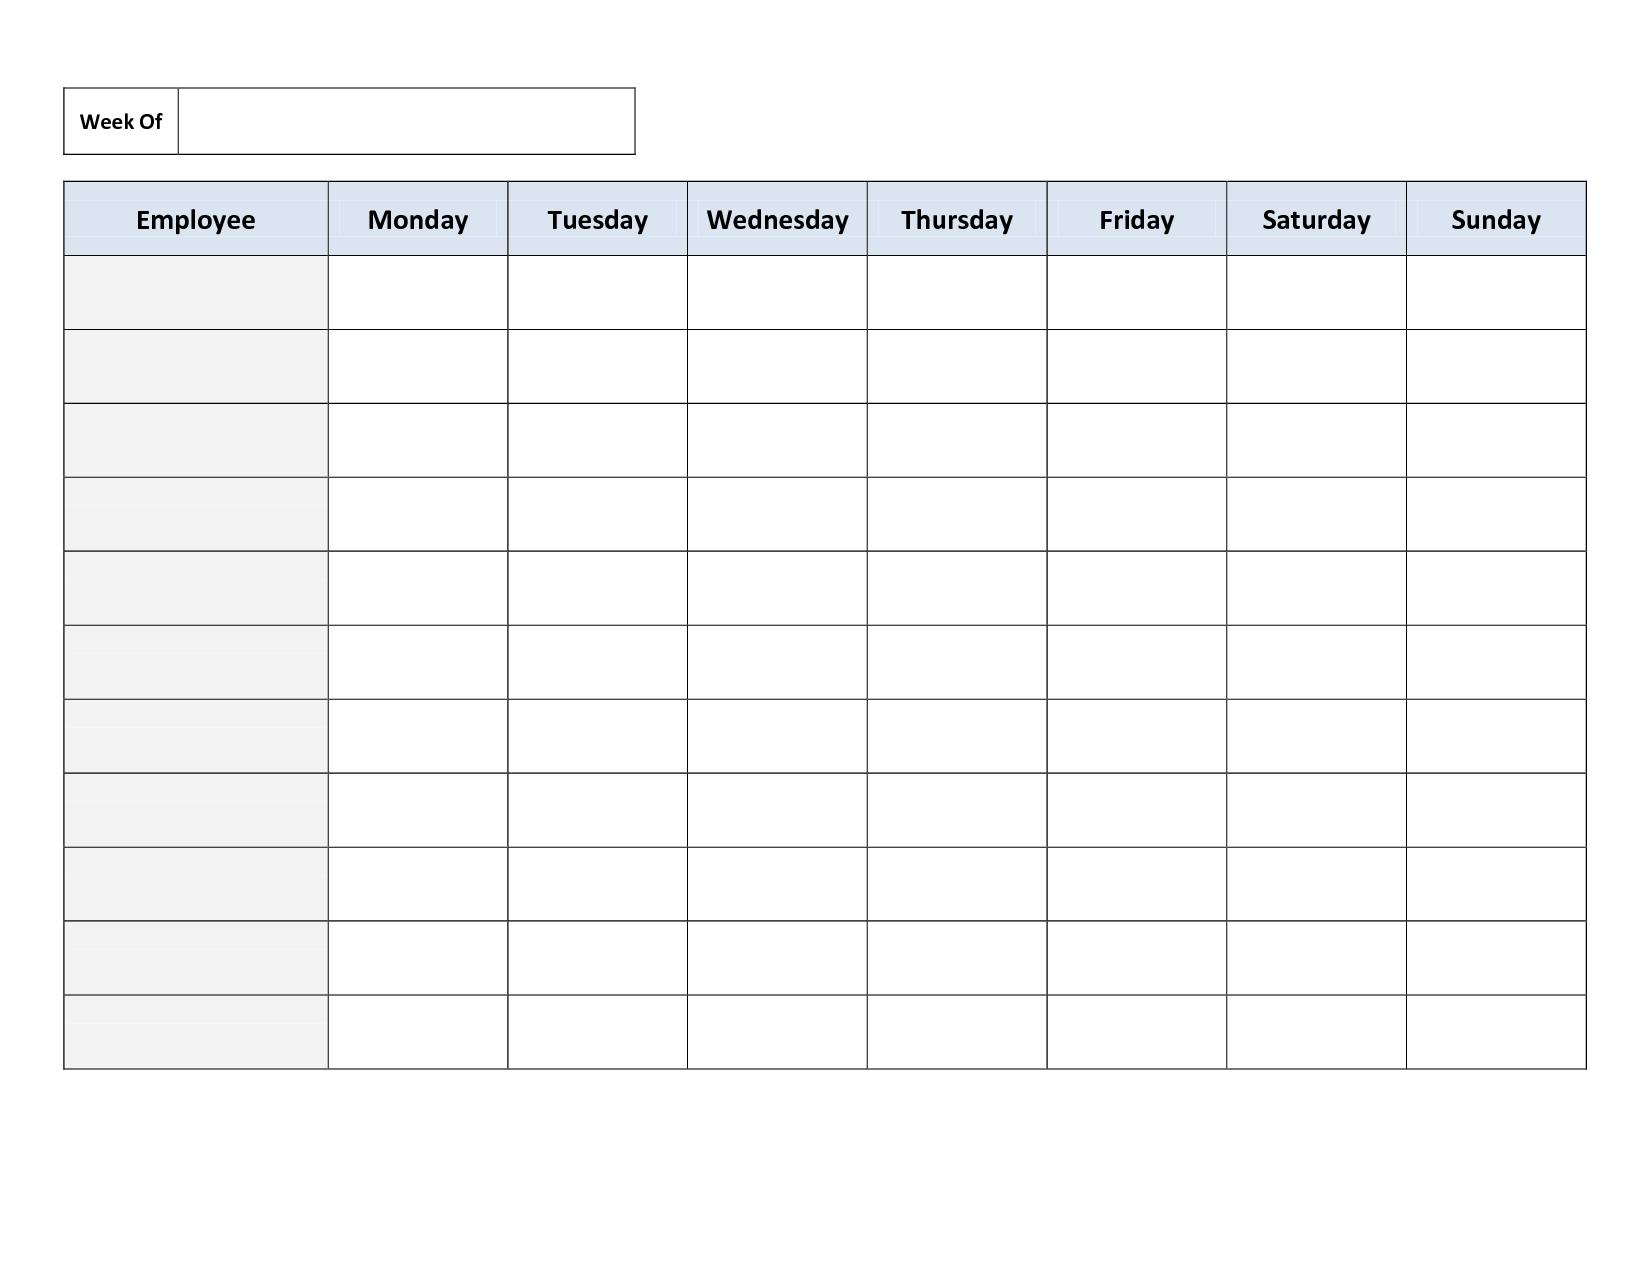 Weekly Employee Work Schedule Template. Free Blank Schedule.pdf - Free Printable Schedule